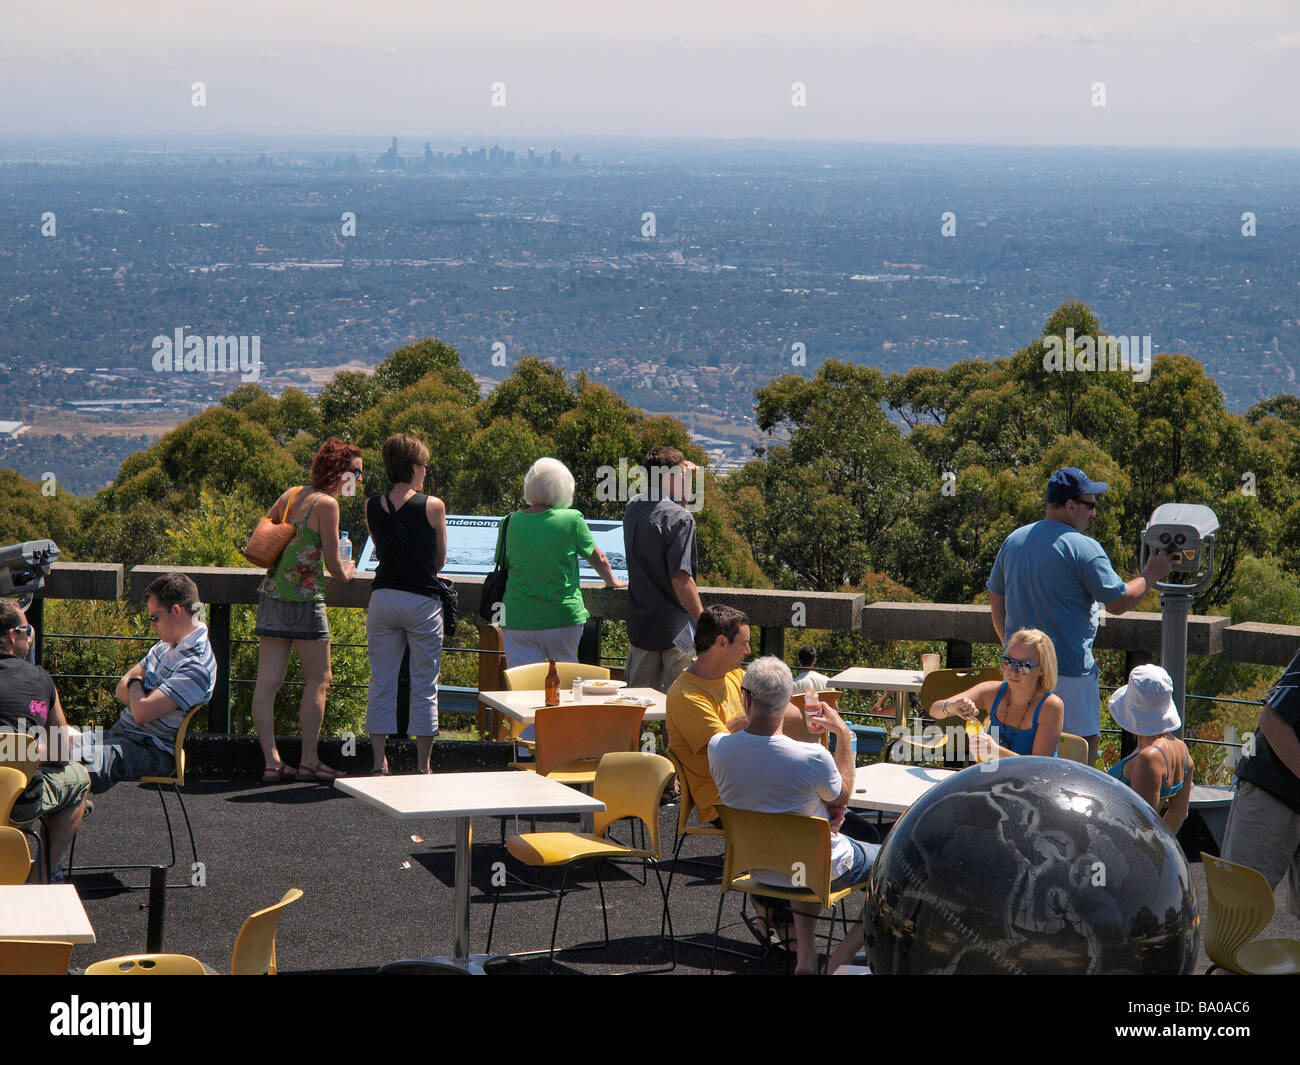 LOOKOUT AT SKYHIGH , MOUNT DANDENONG VICTORIA AUSTRALIA - Stock Image